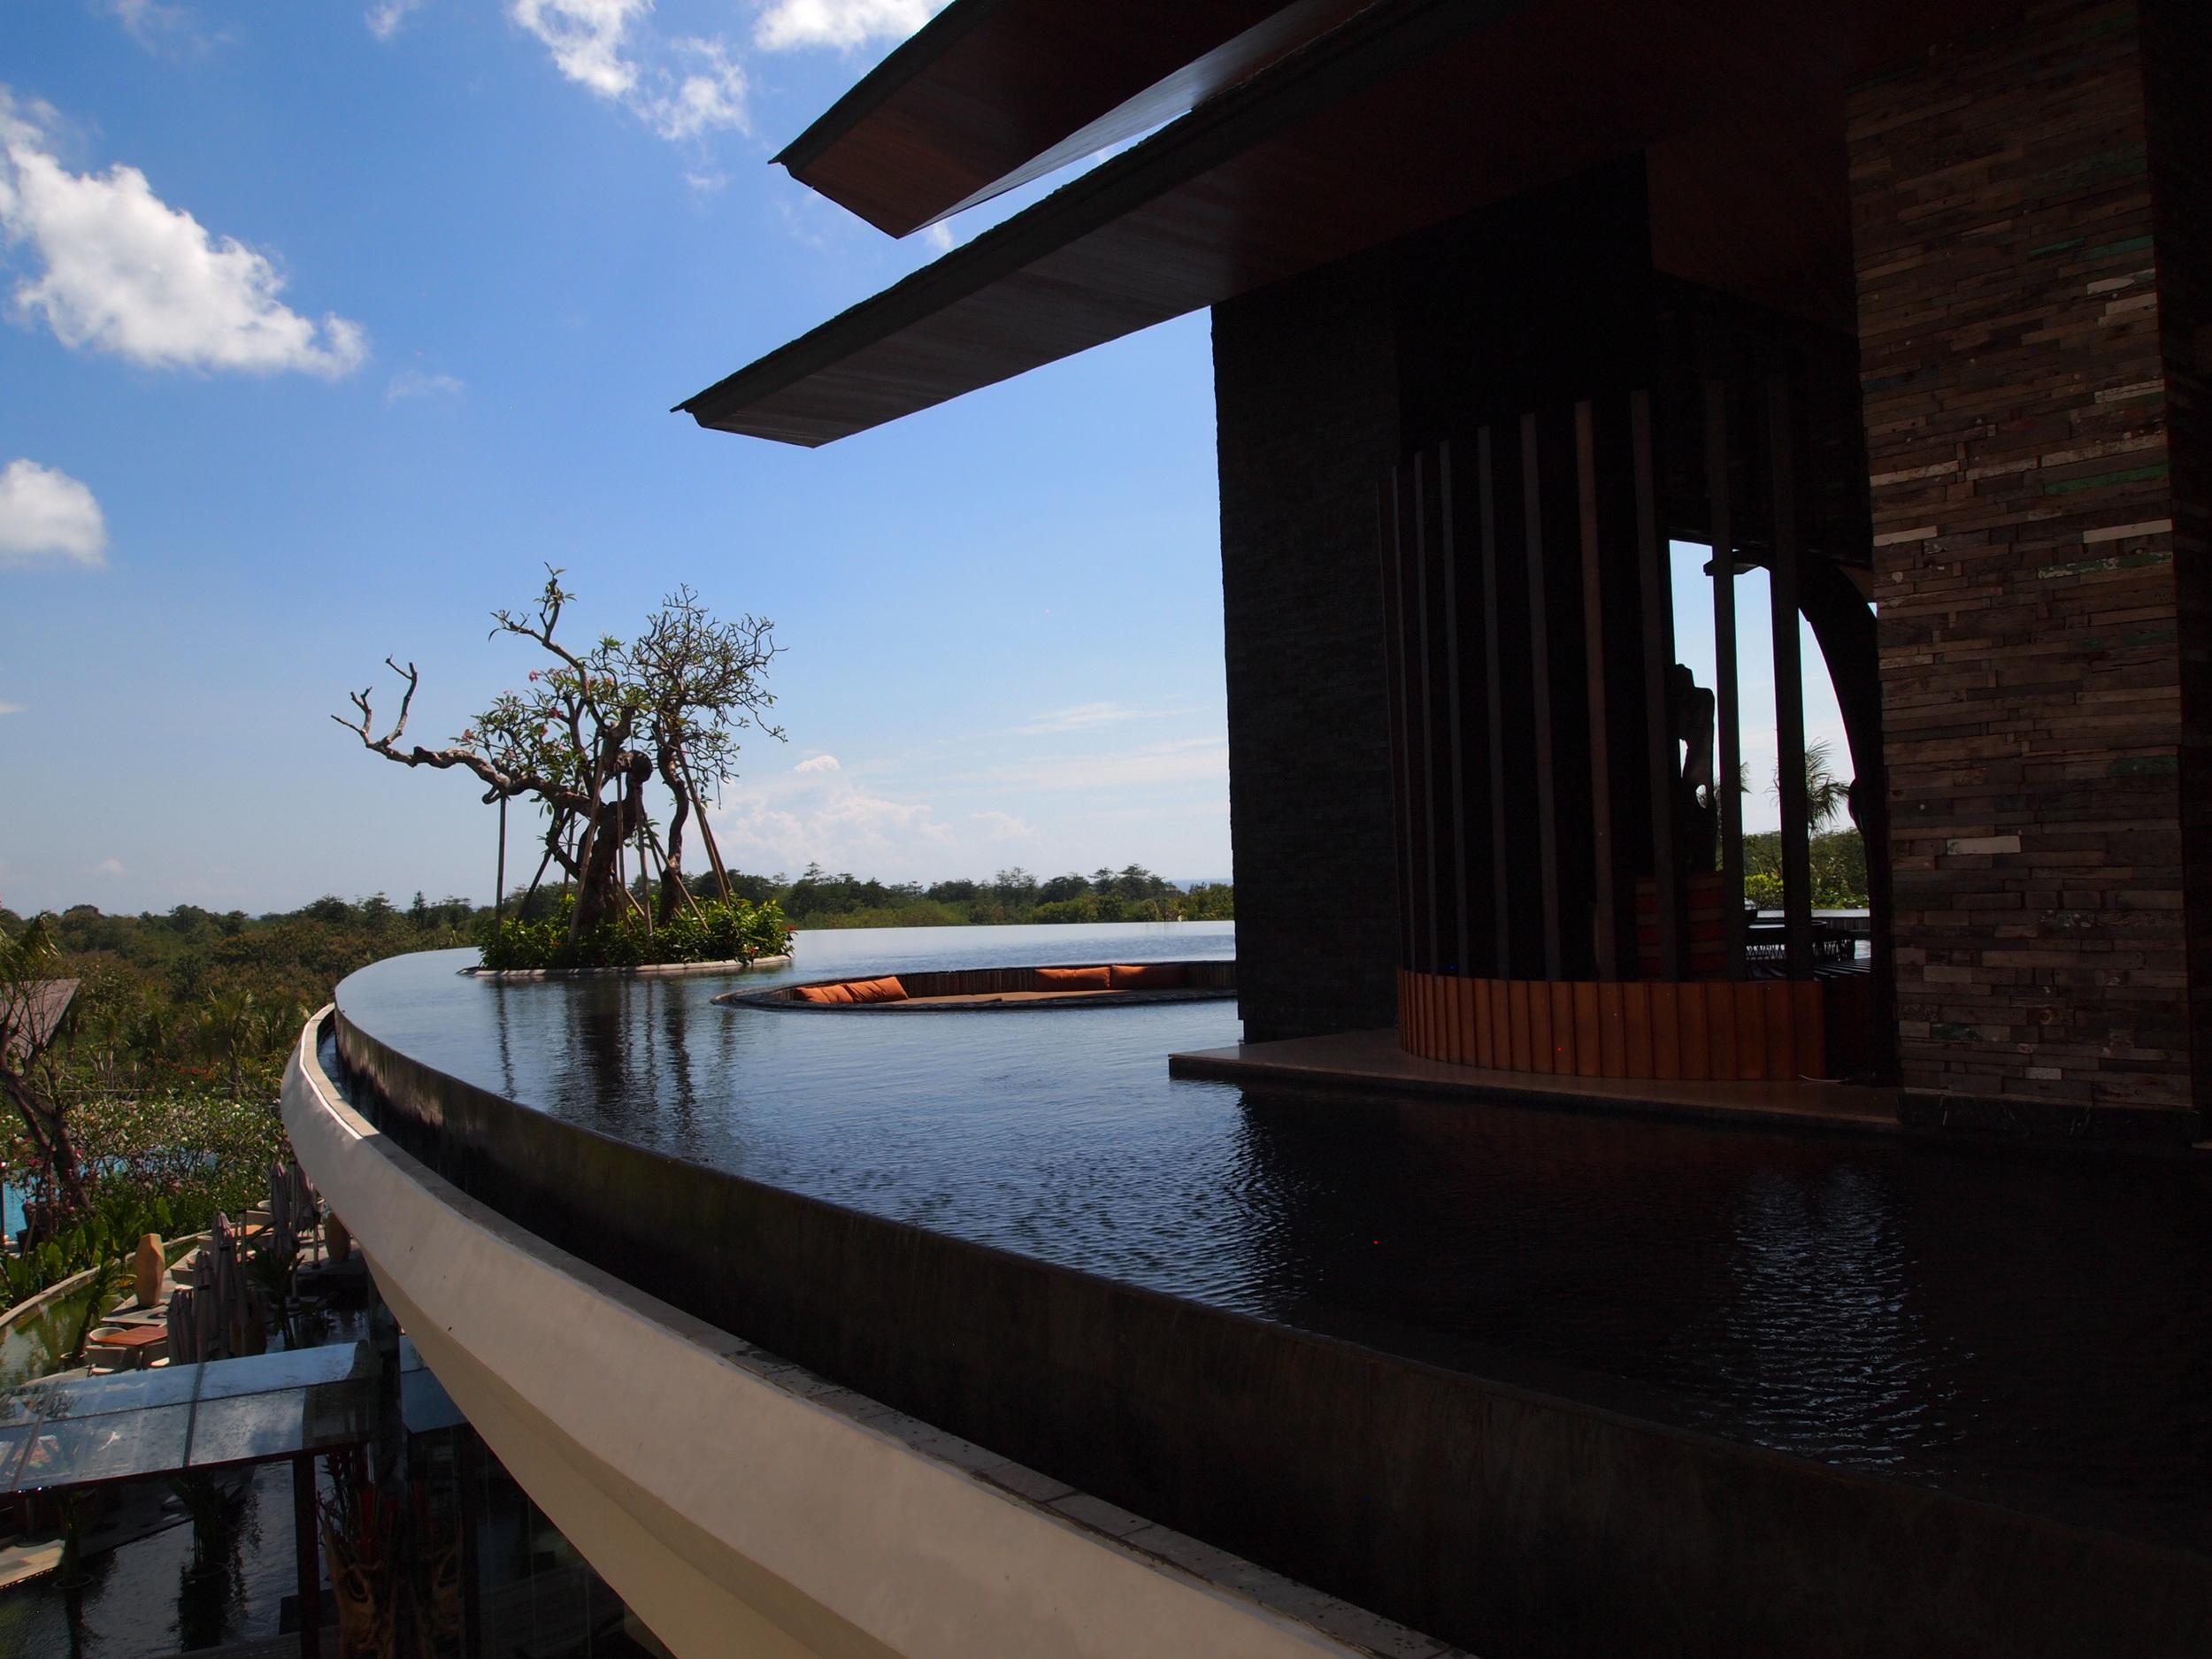 Infinity pool extending the lobby's reach.